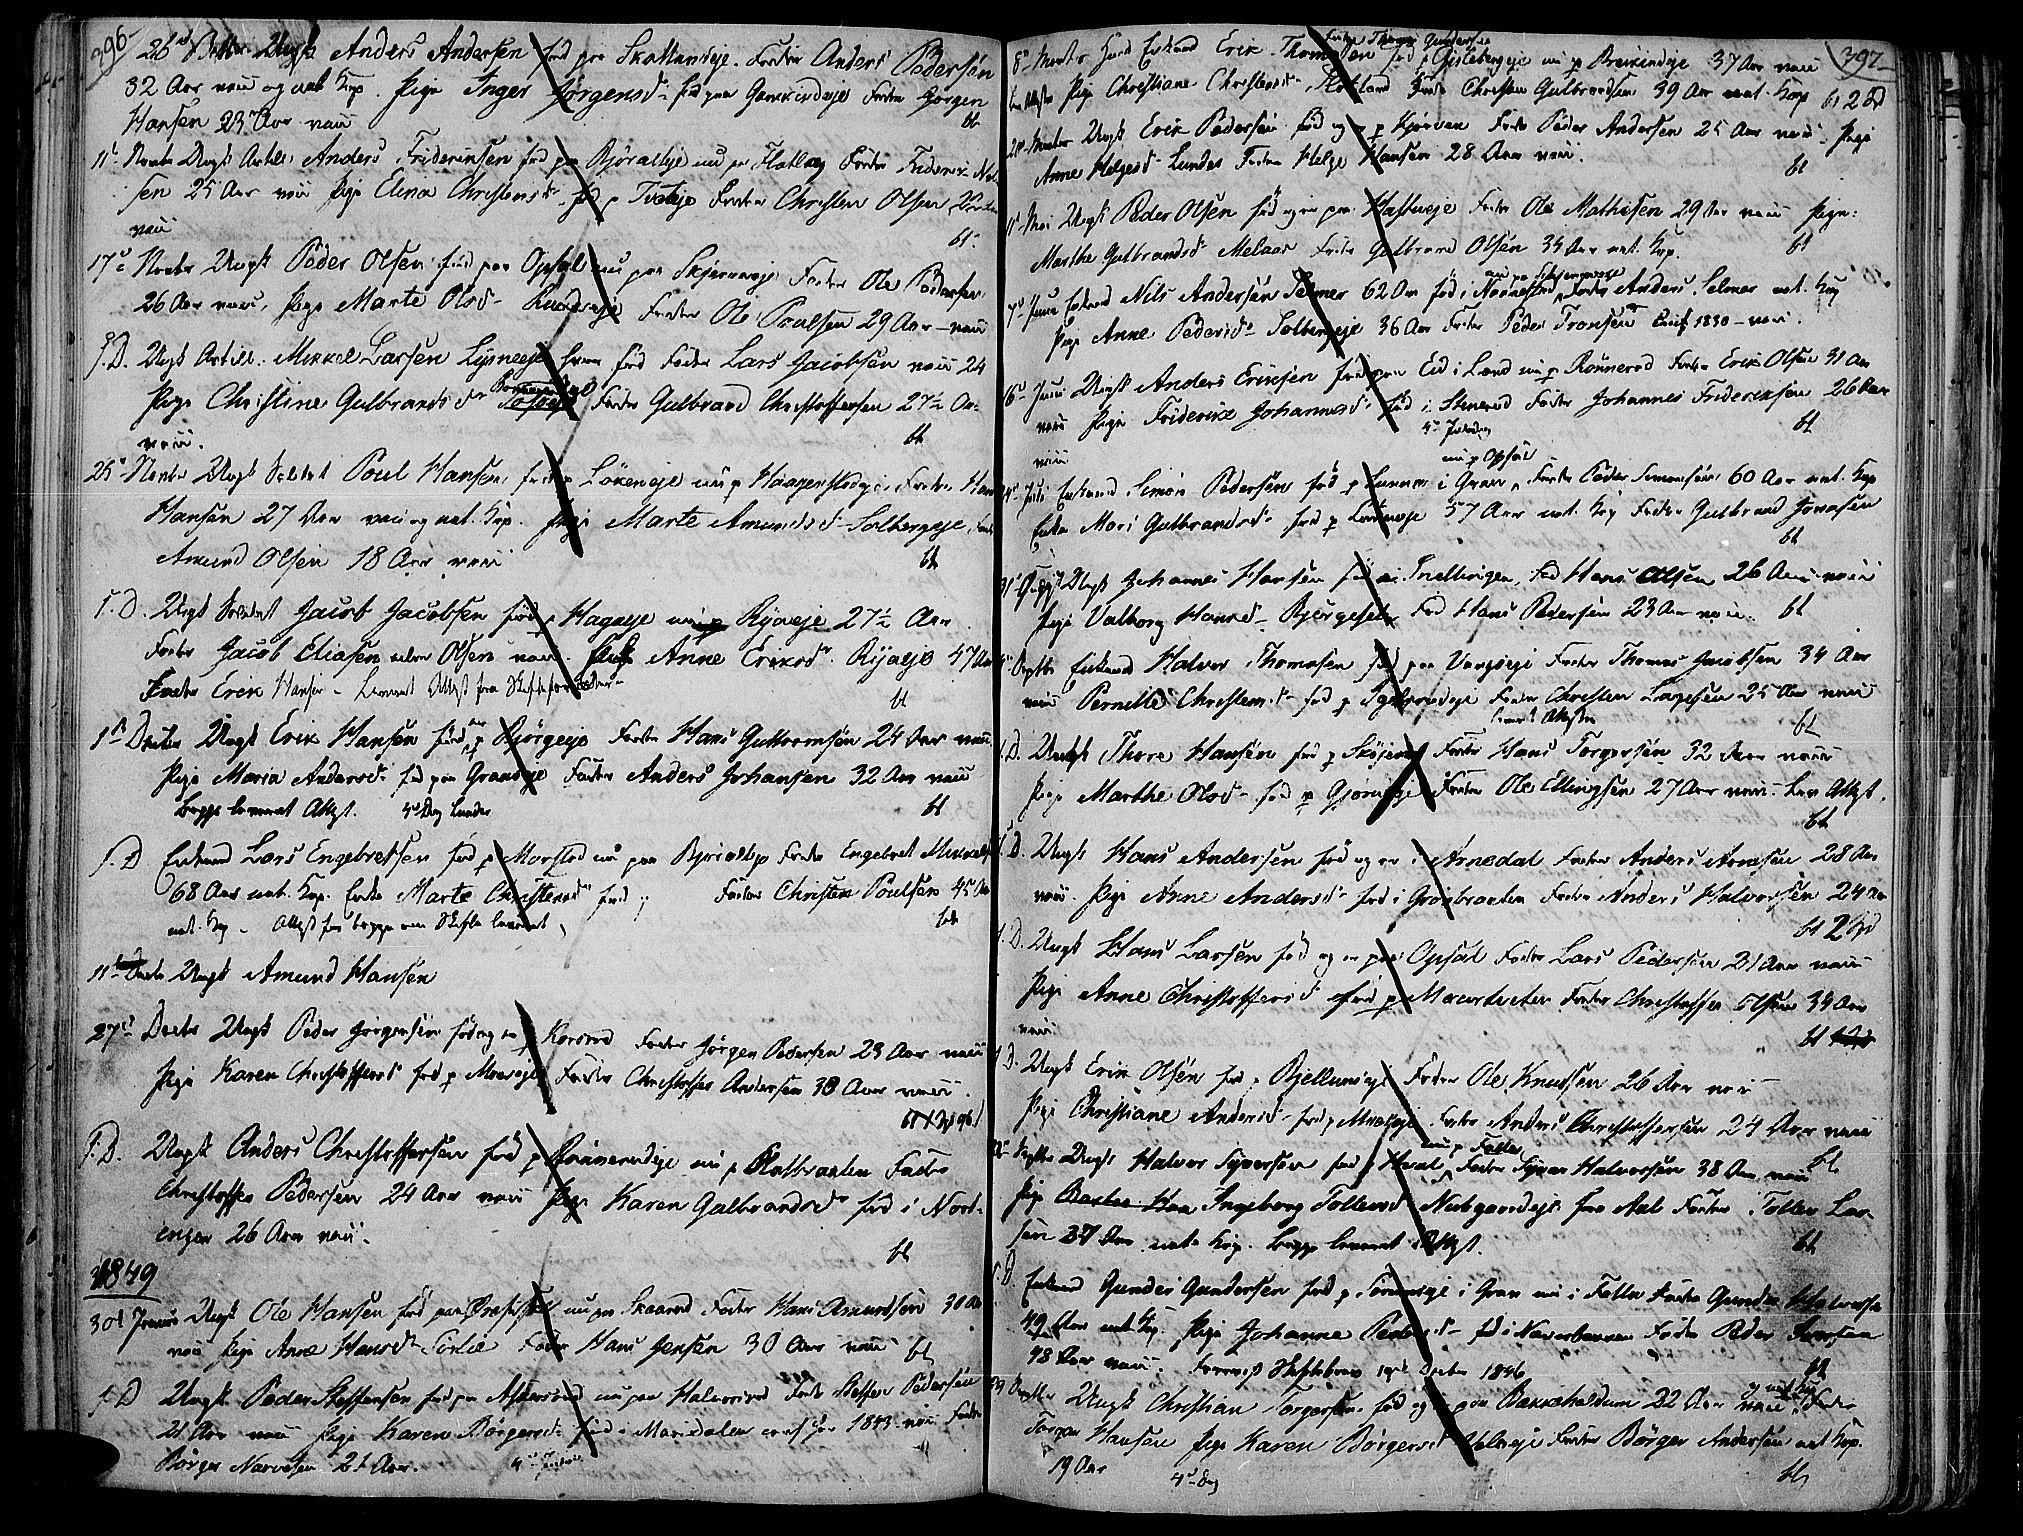 SAH, Jevnaker prestekontor, Ministerialbok nr. 4, 1800-1861, s. 396-397